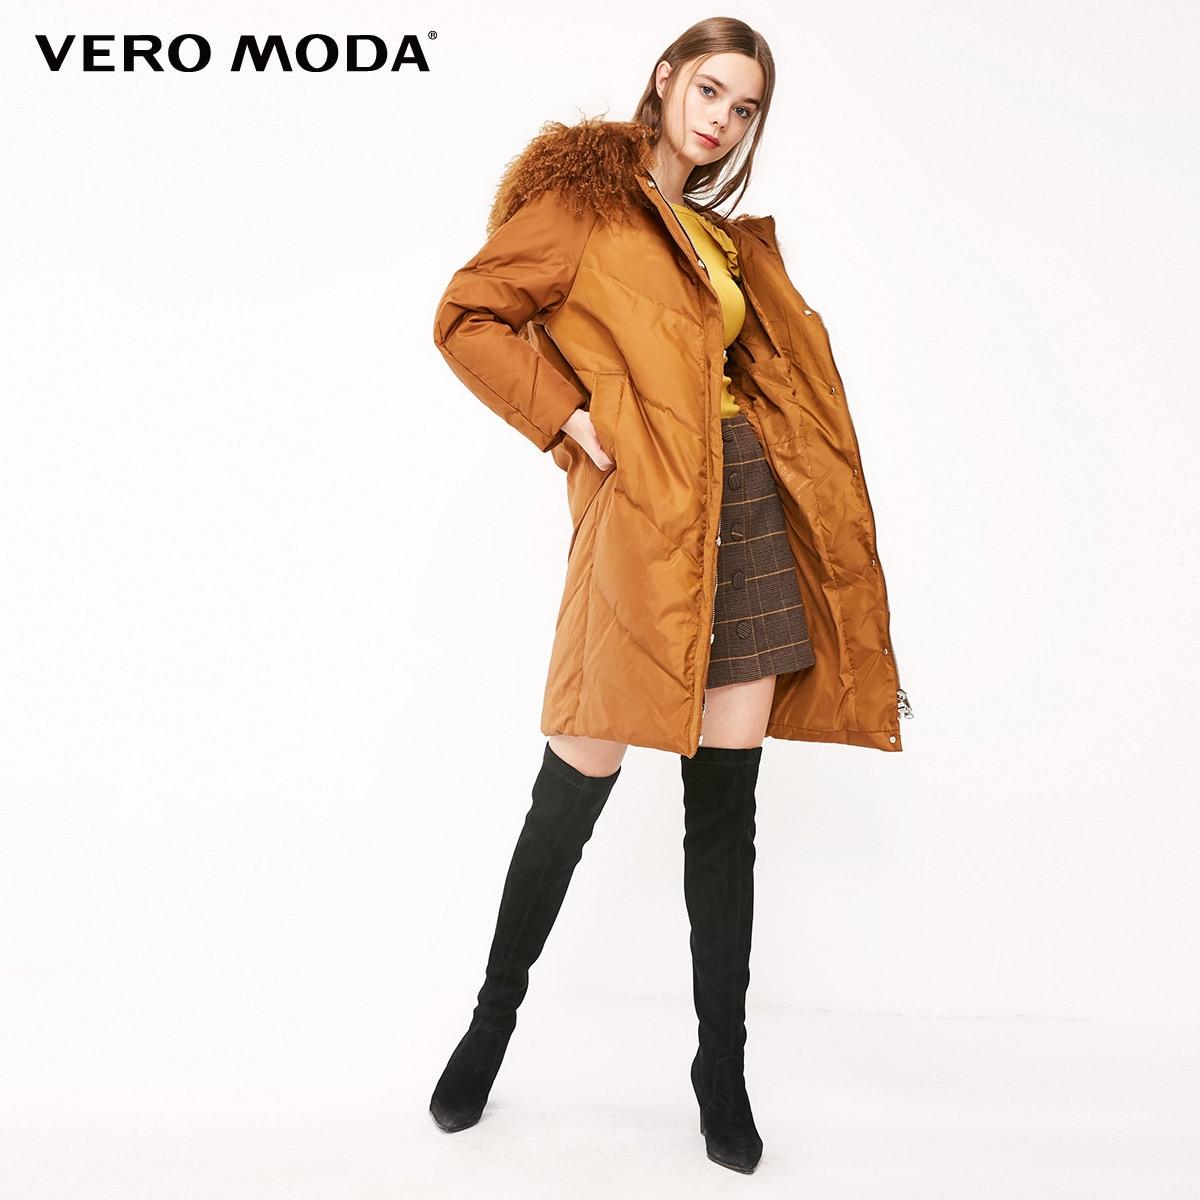 Vero Moda 2019 Women's 90% White Duck   Down   Sheep Fur Collar Hooded   Down   Jacket Parka   Coat   | 318412556